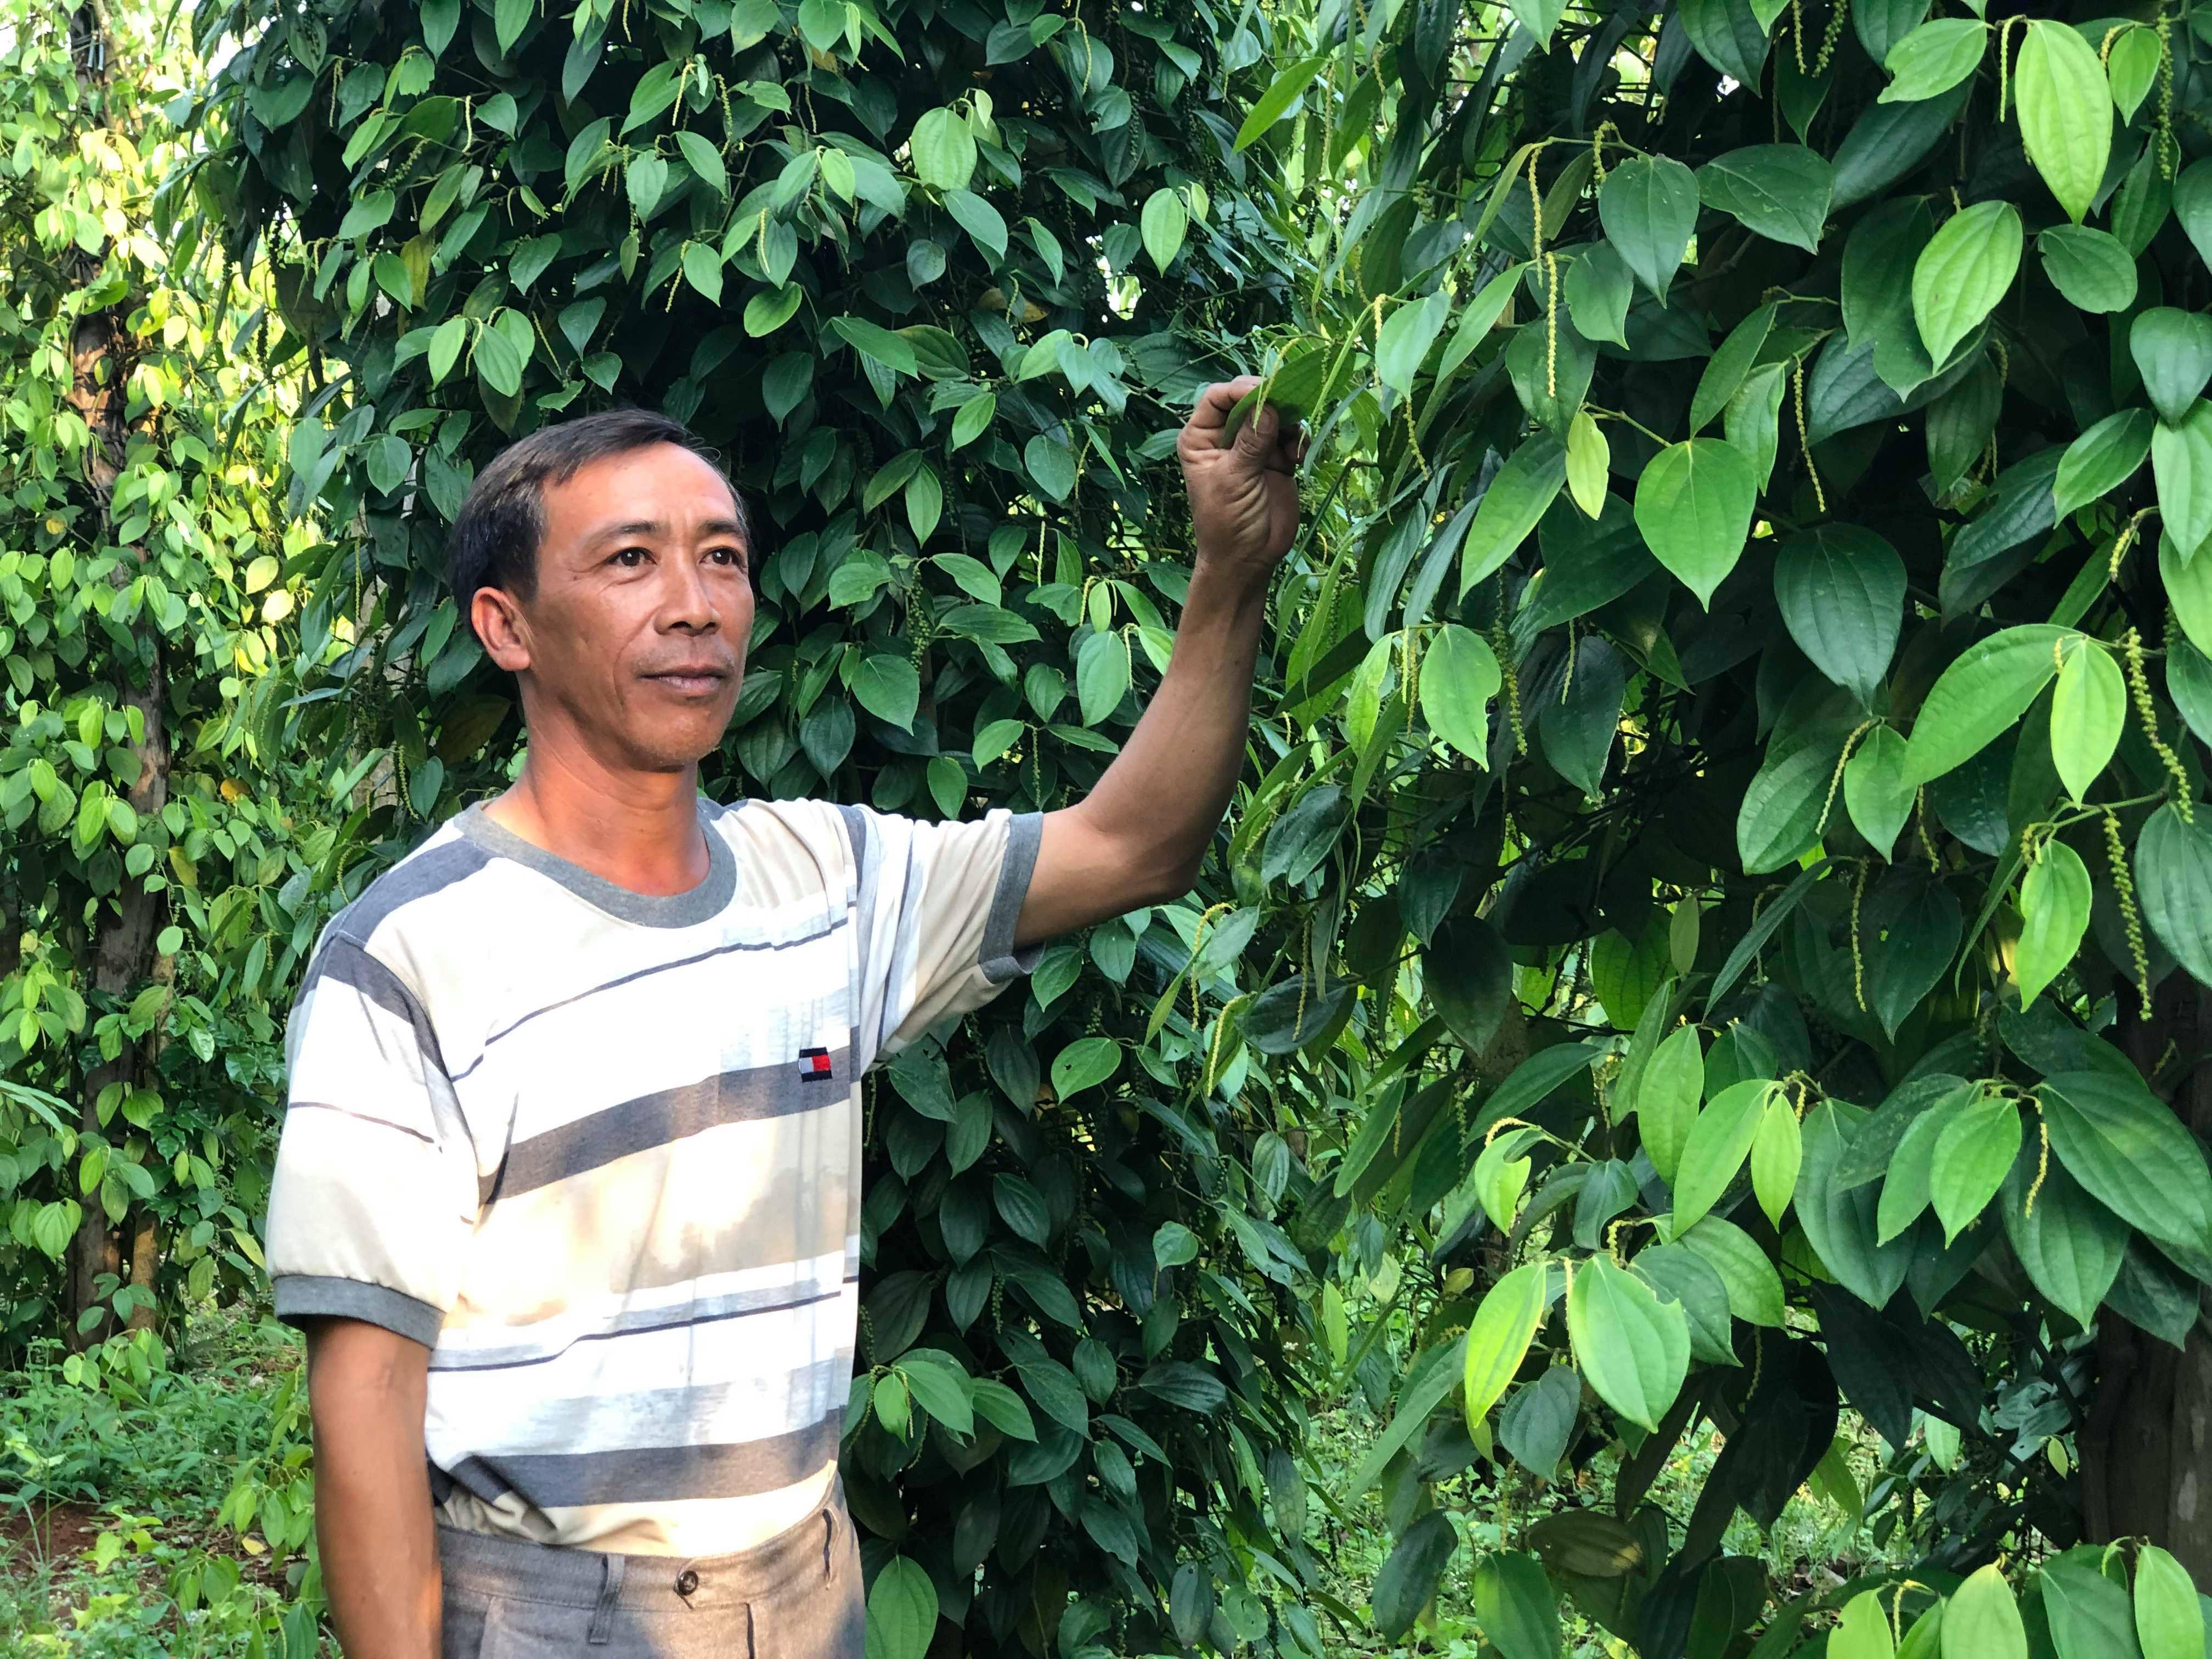 Nguyen Van Quang - Pepper farmer in Ia Phang village, Gia Lai province - Photo: Hong Van